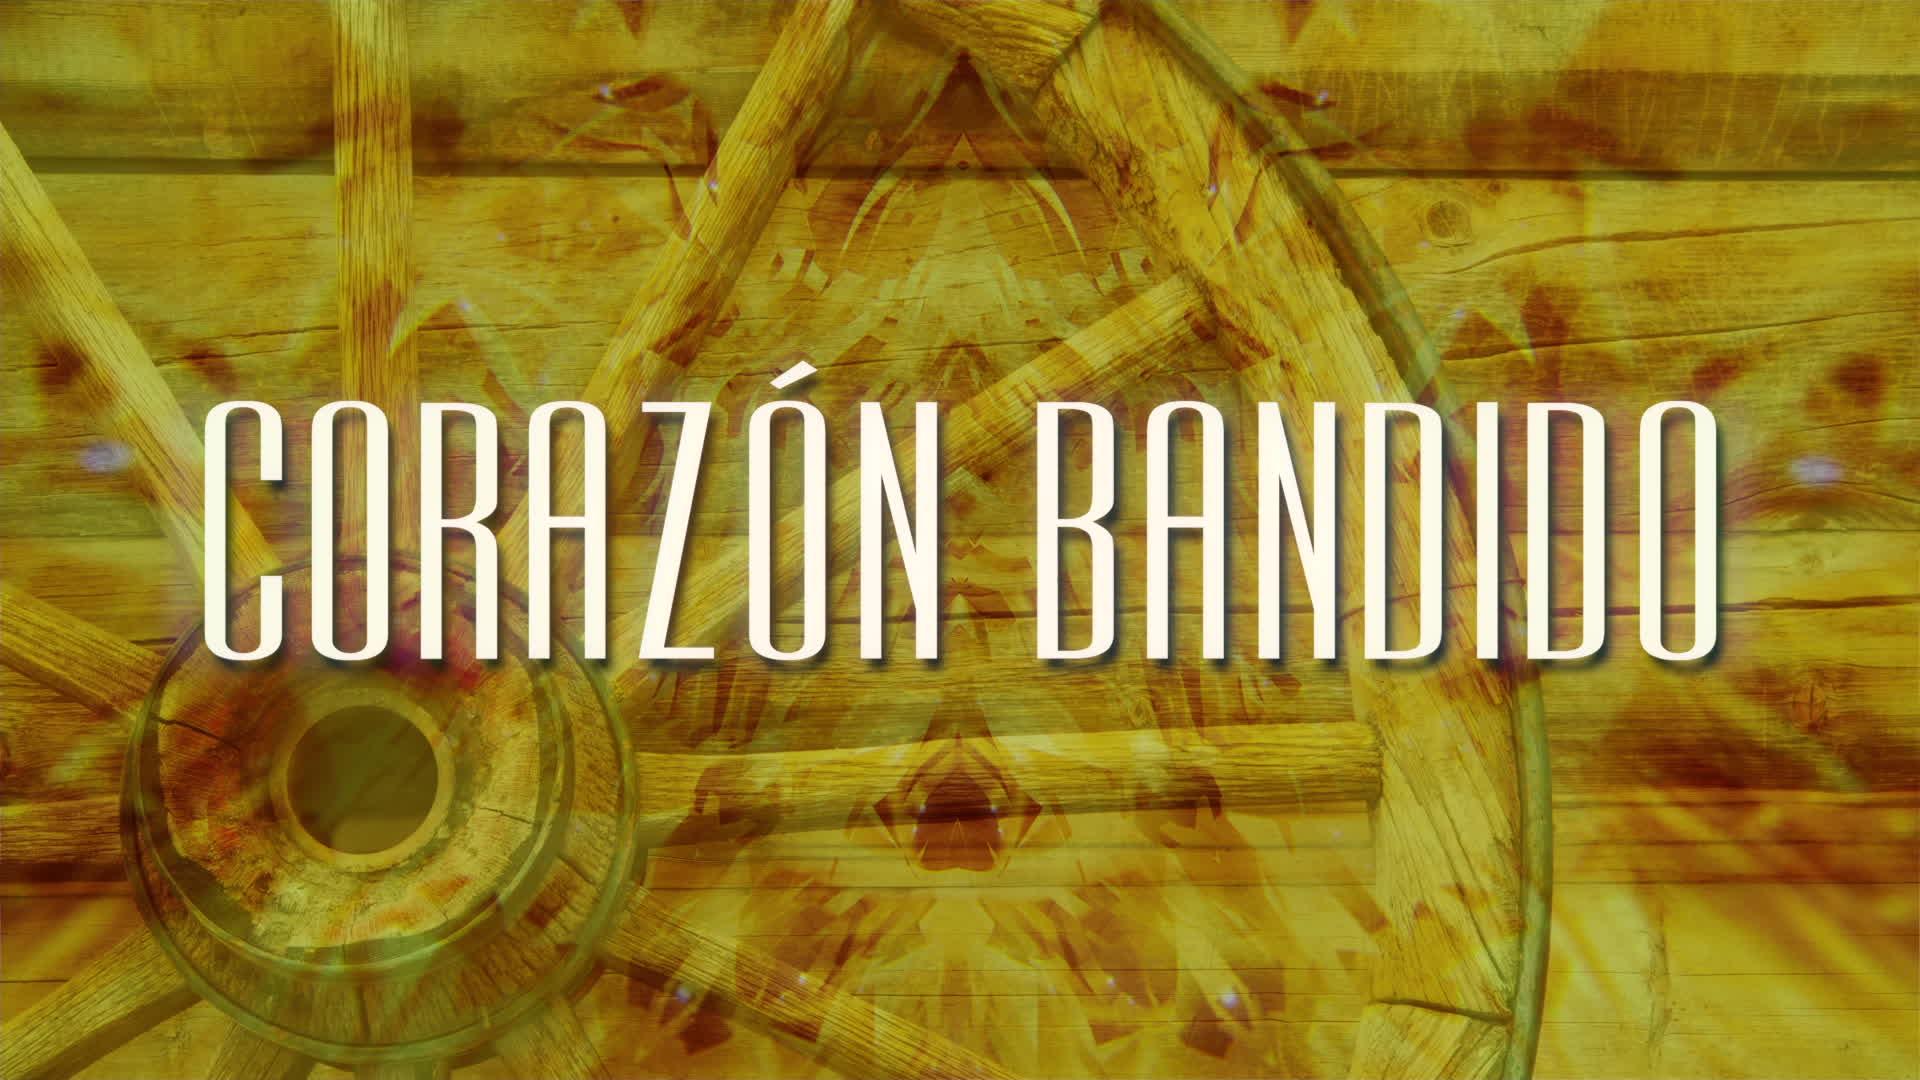 Bronco – Corazón Bandido